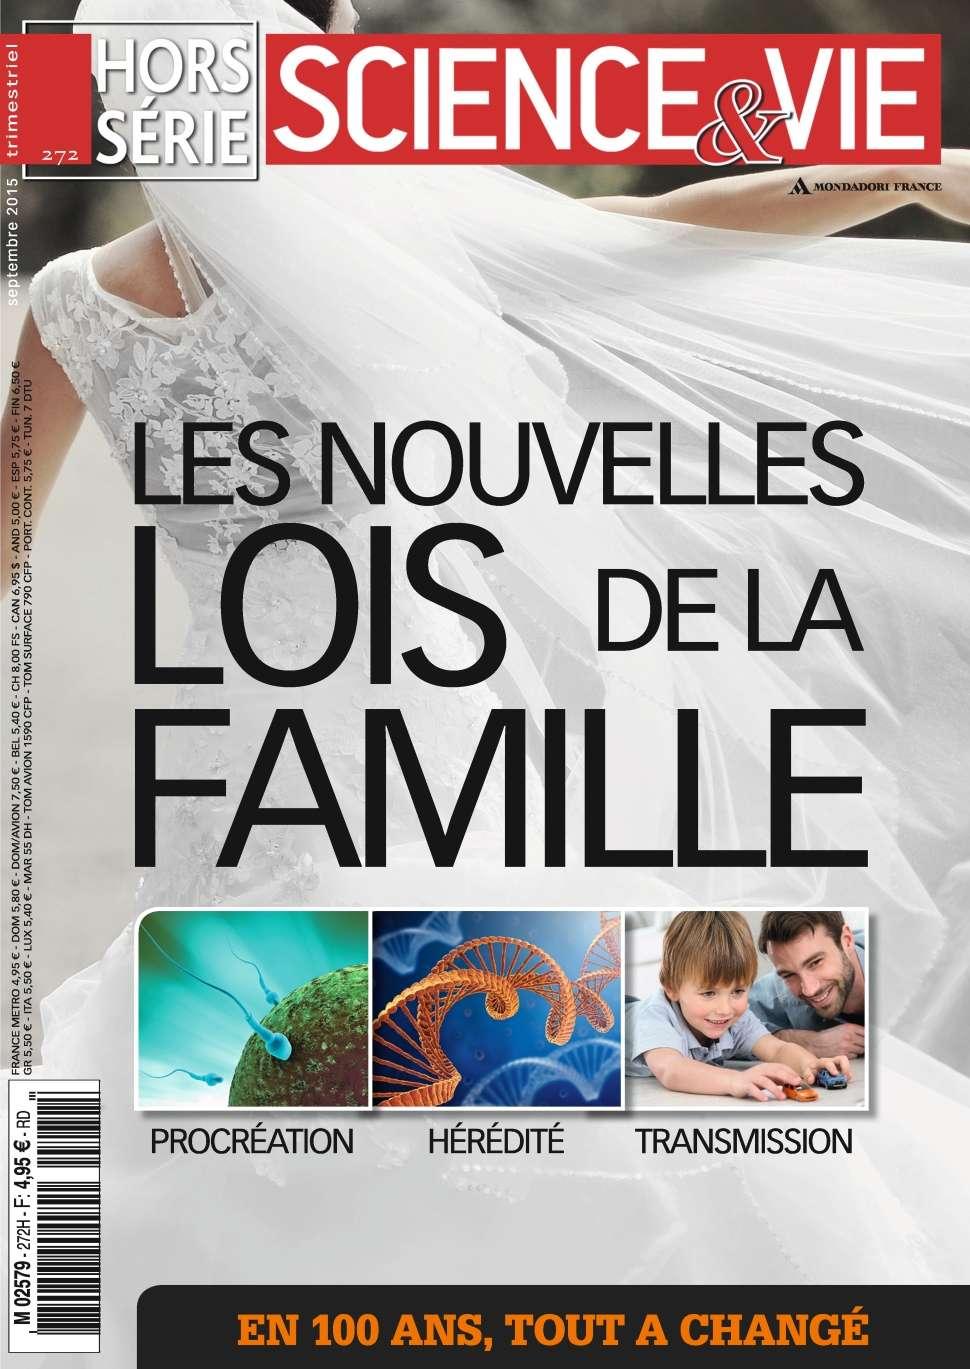 Science & Vie Hors-Série 272 - Septembre 2015